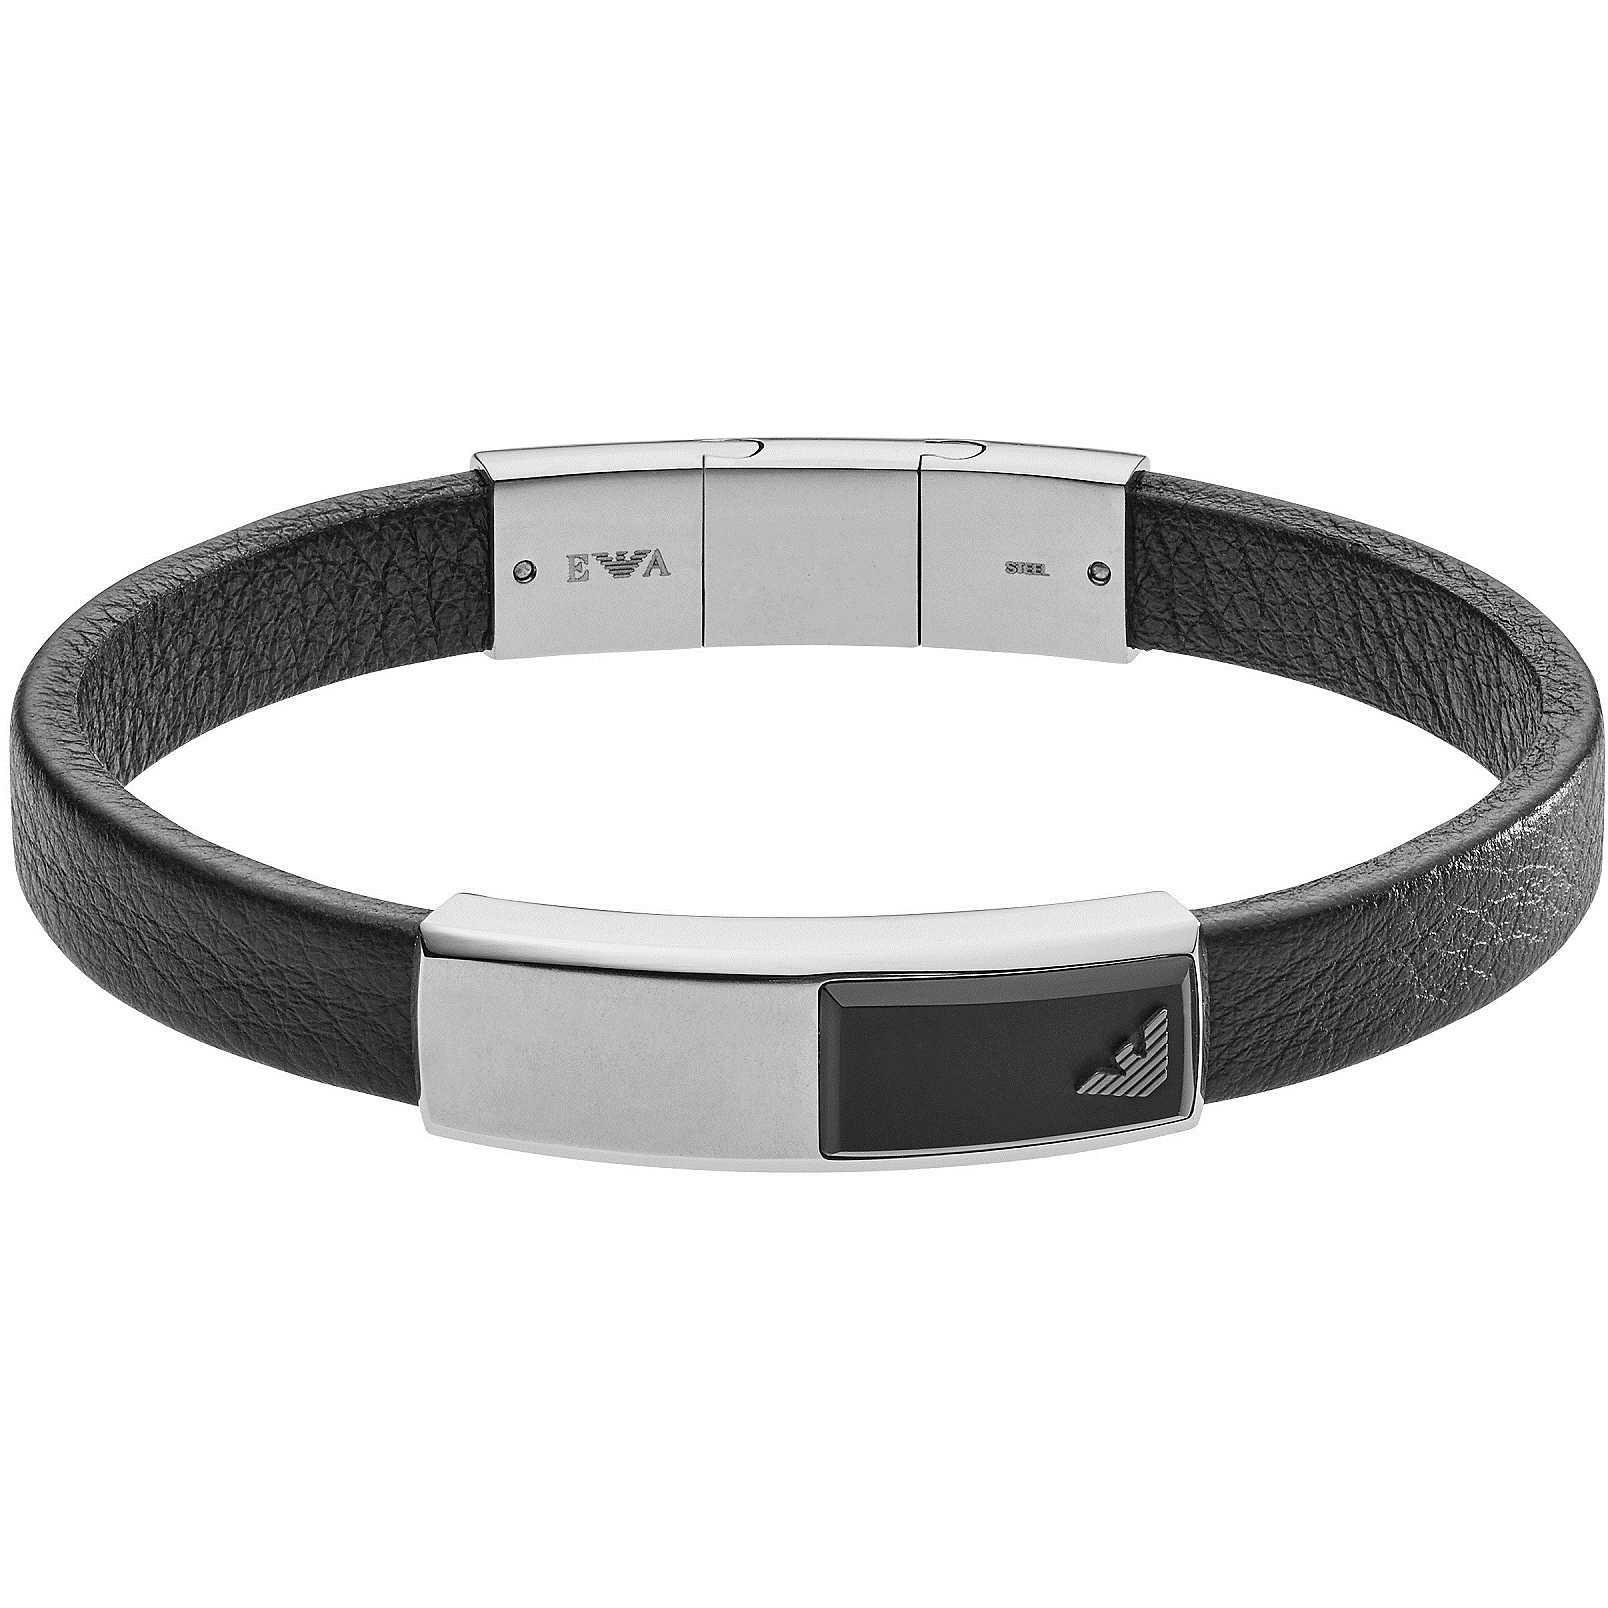 bracelet man jewellery Emporio Armani EGS2288040 bracelets Emporio ... bd9bb5dface